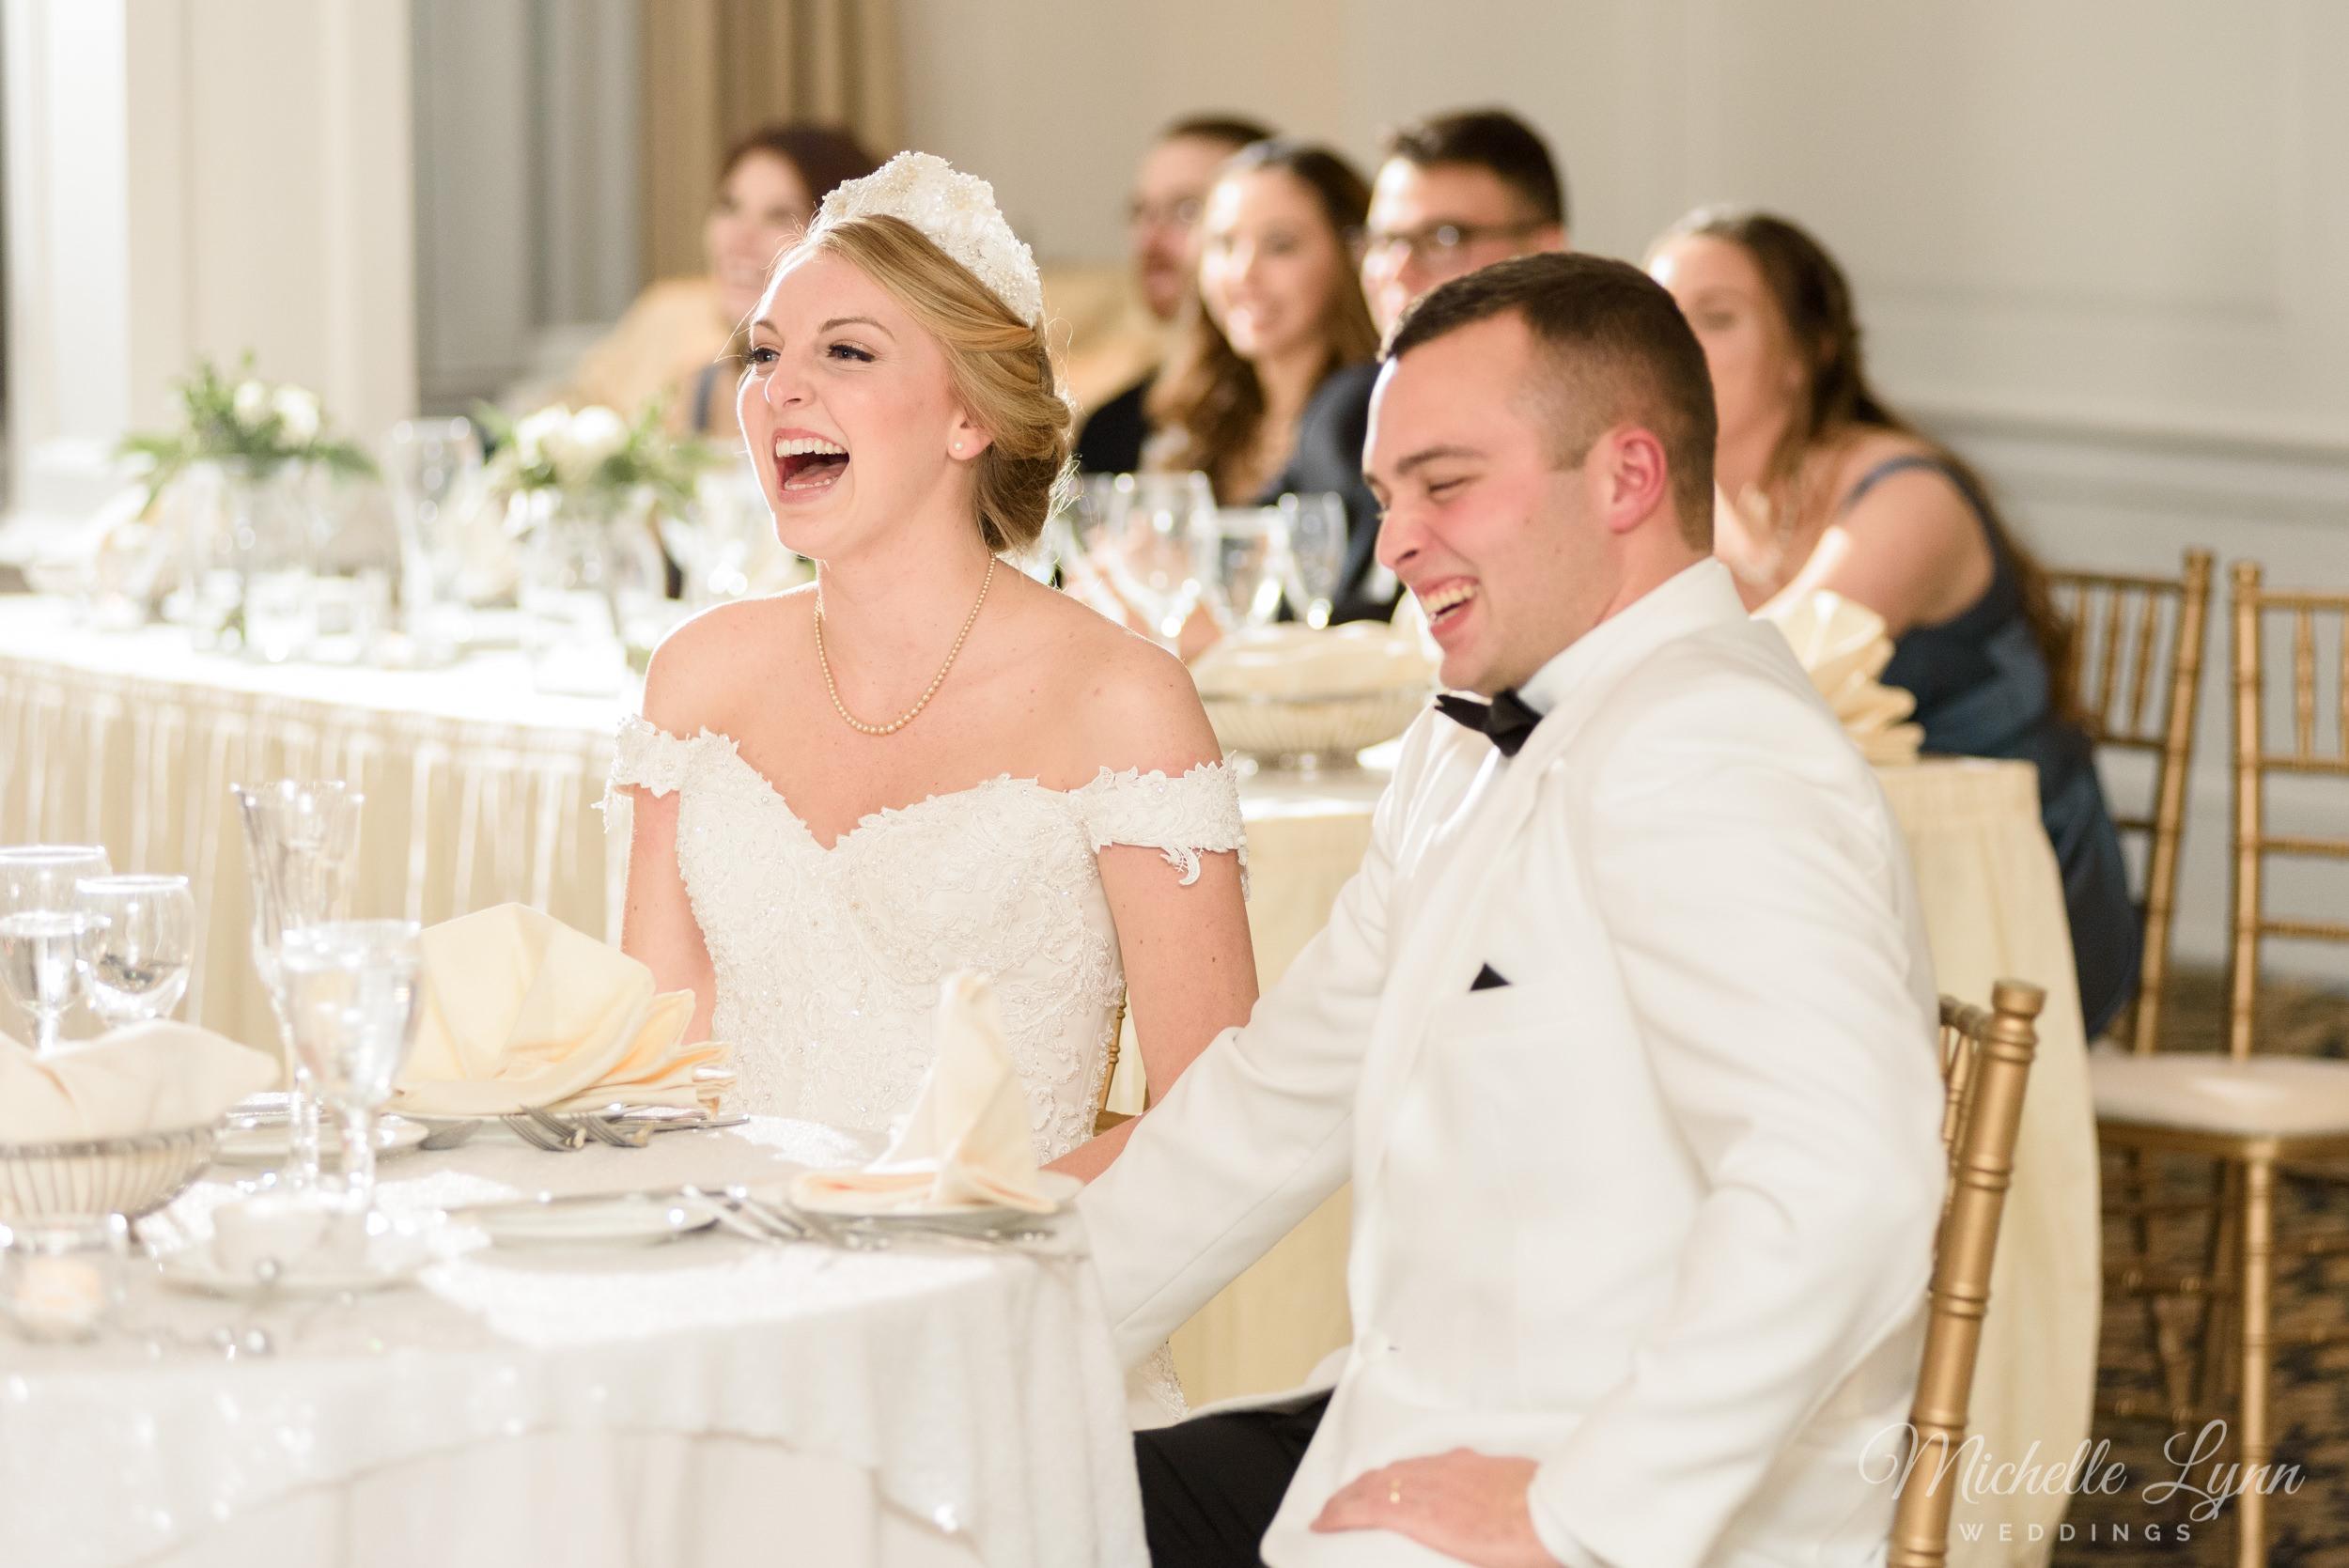 william-penn-inn-wedding-photography-mlw-88.jpg